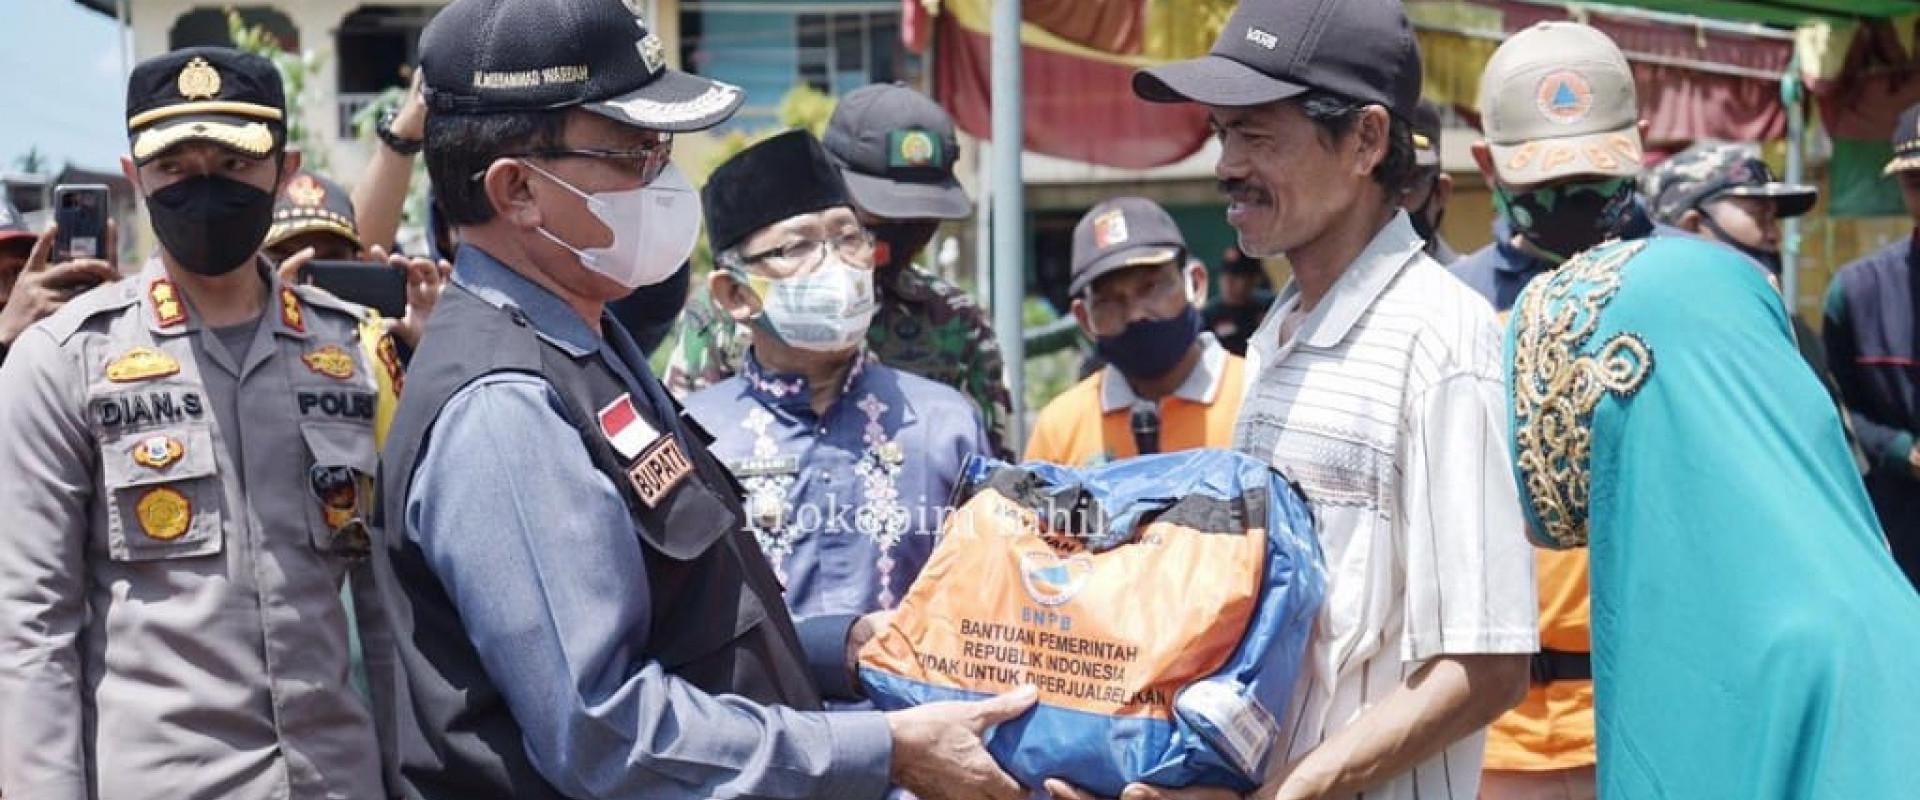 Tinjau korban Bencana Alam di  desa Sanglar, Bupati HM.Wardan Salurkan Bantuan